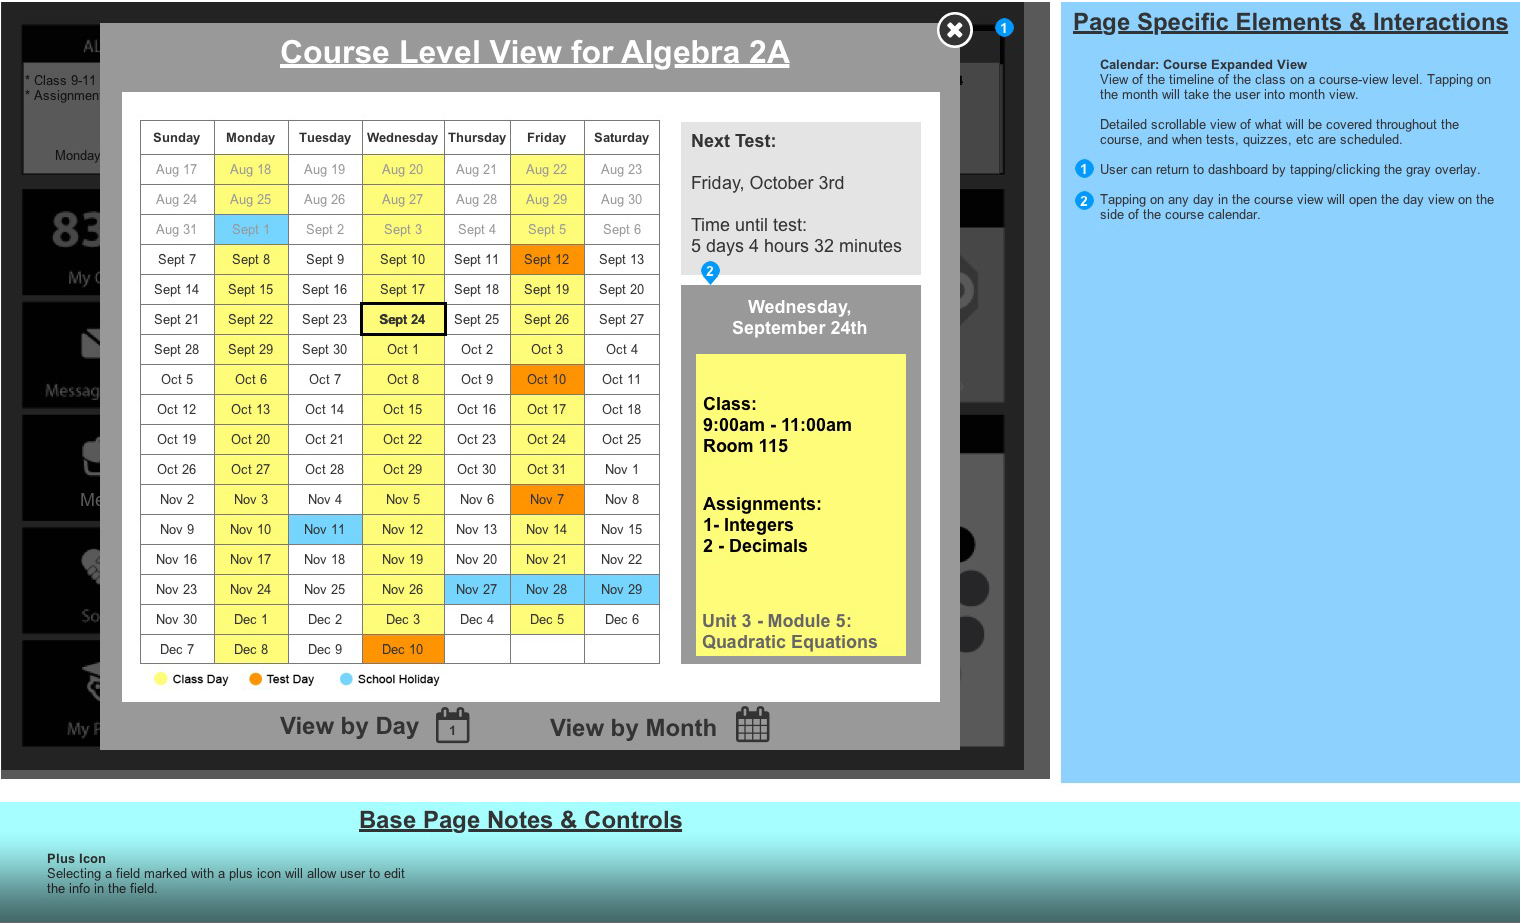 Course Level Calendar View